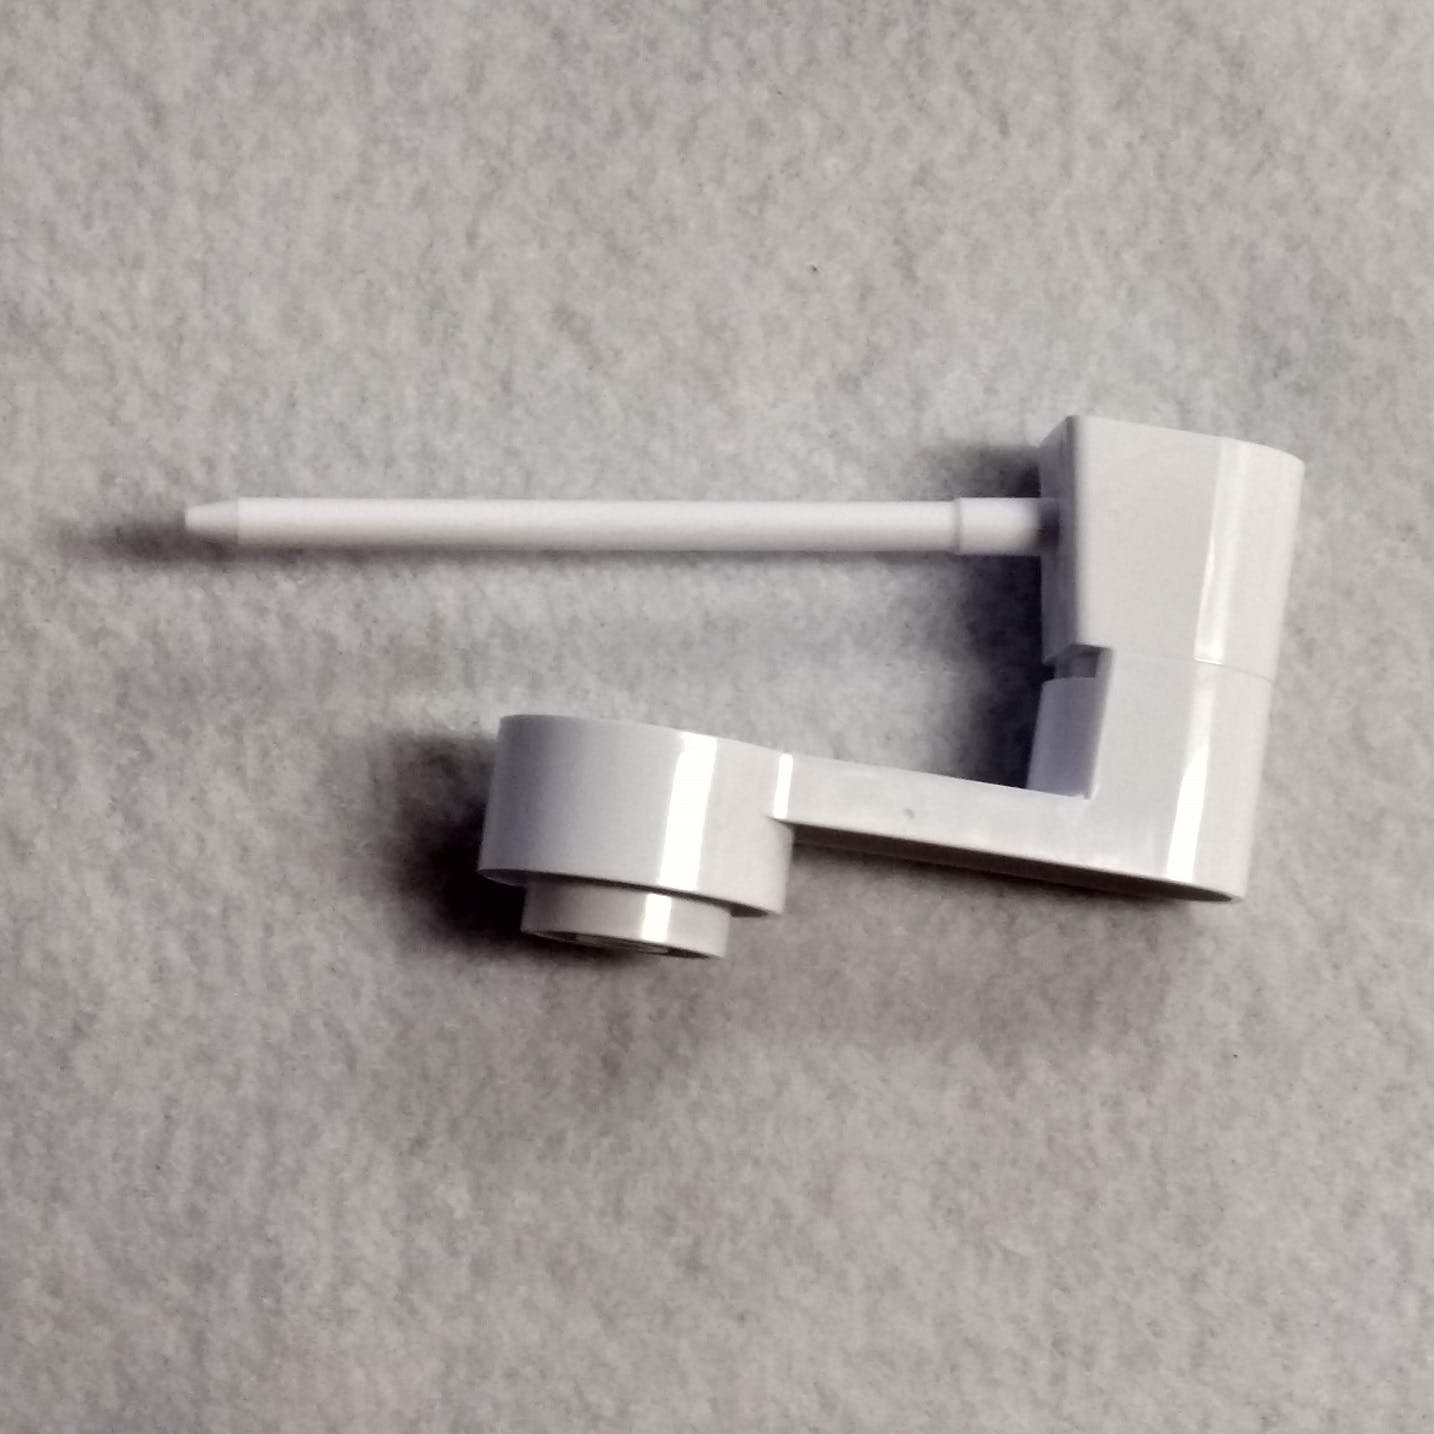 Baby Lock Spool Pin (Horizontal) XG9521001